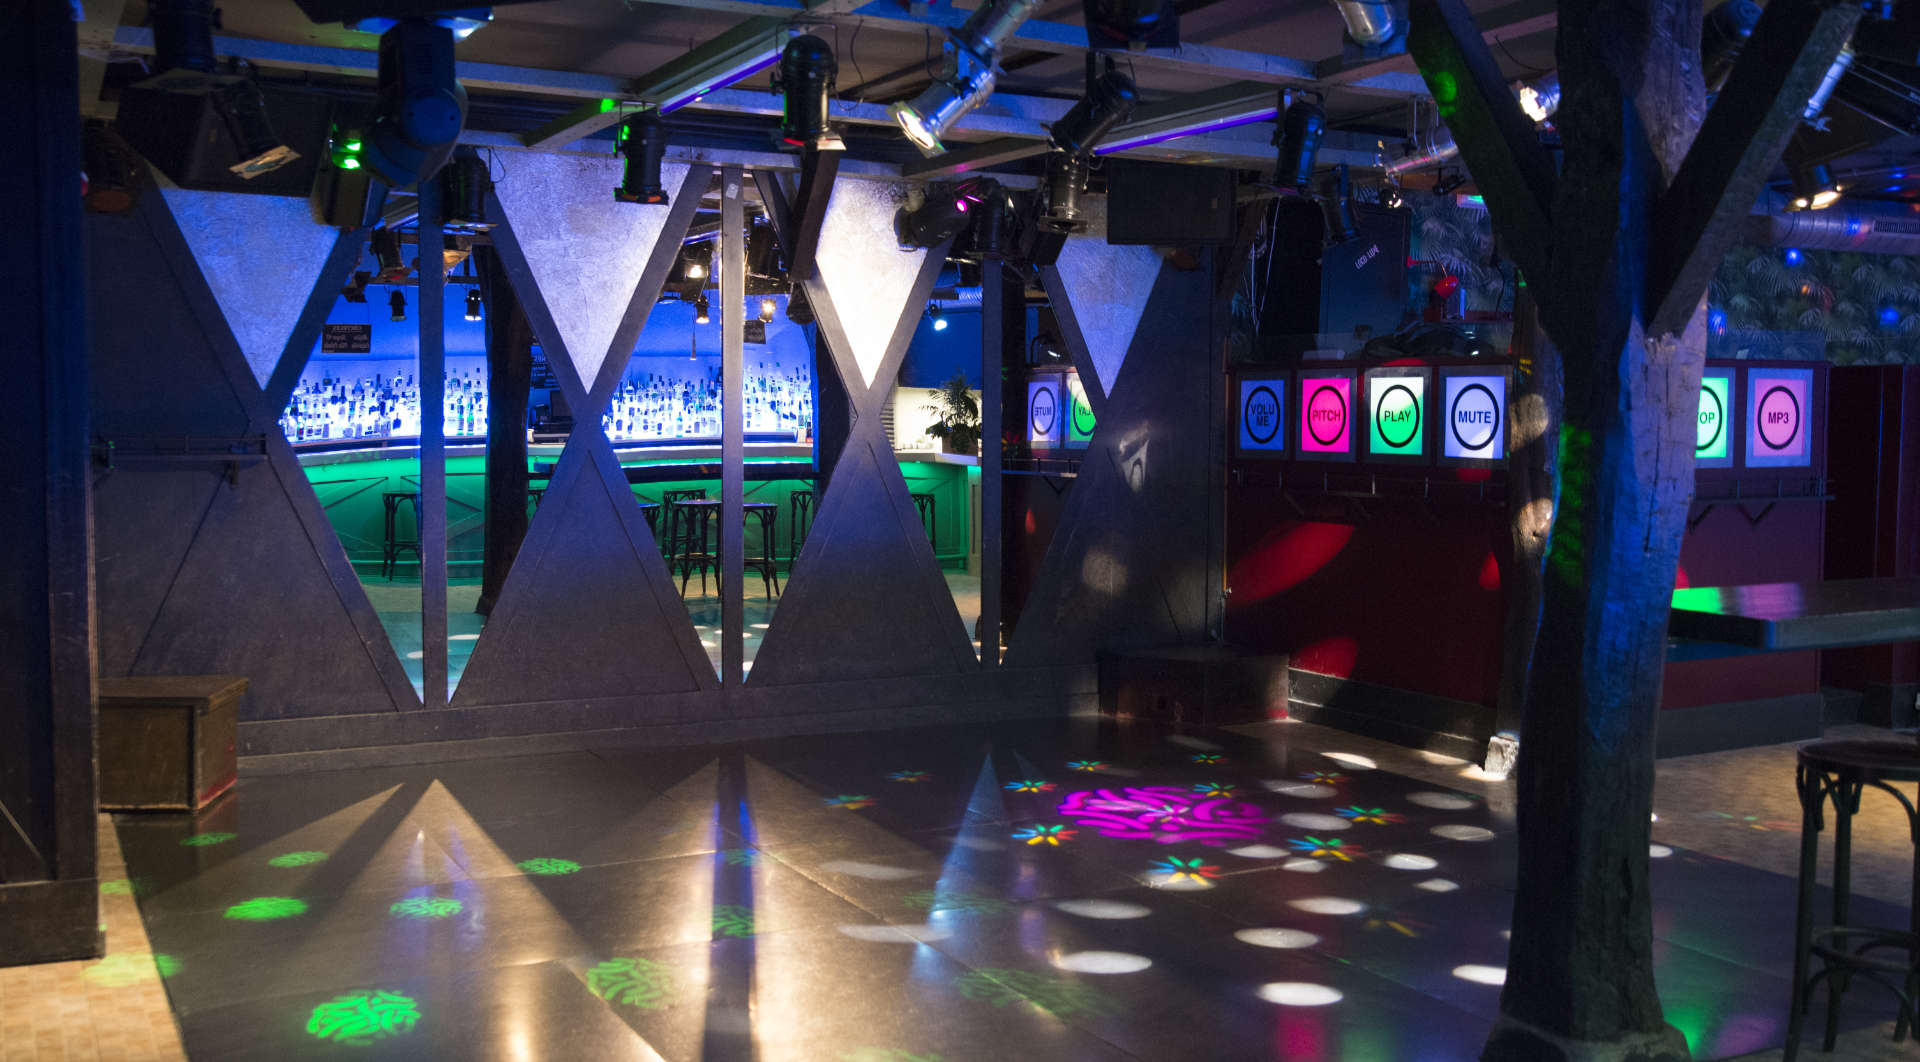 Pista de baile Discoteca Safari - Castro Urdiales